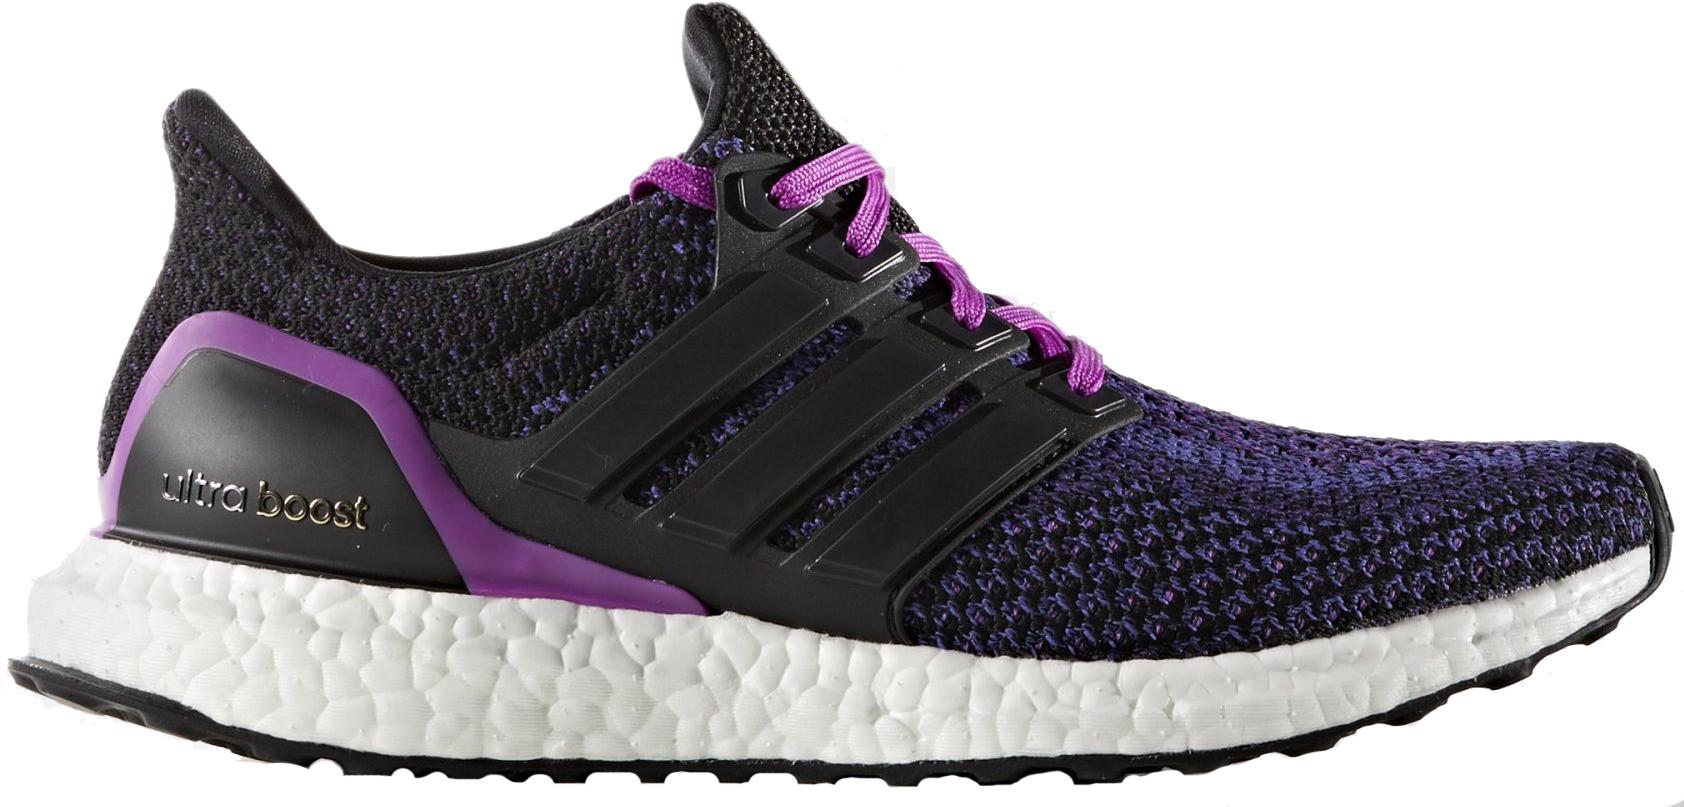 adidas Ultra Boost 2.0 Shock Purple (W)